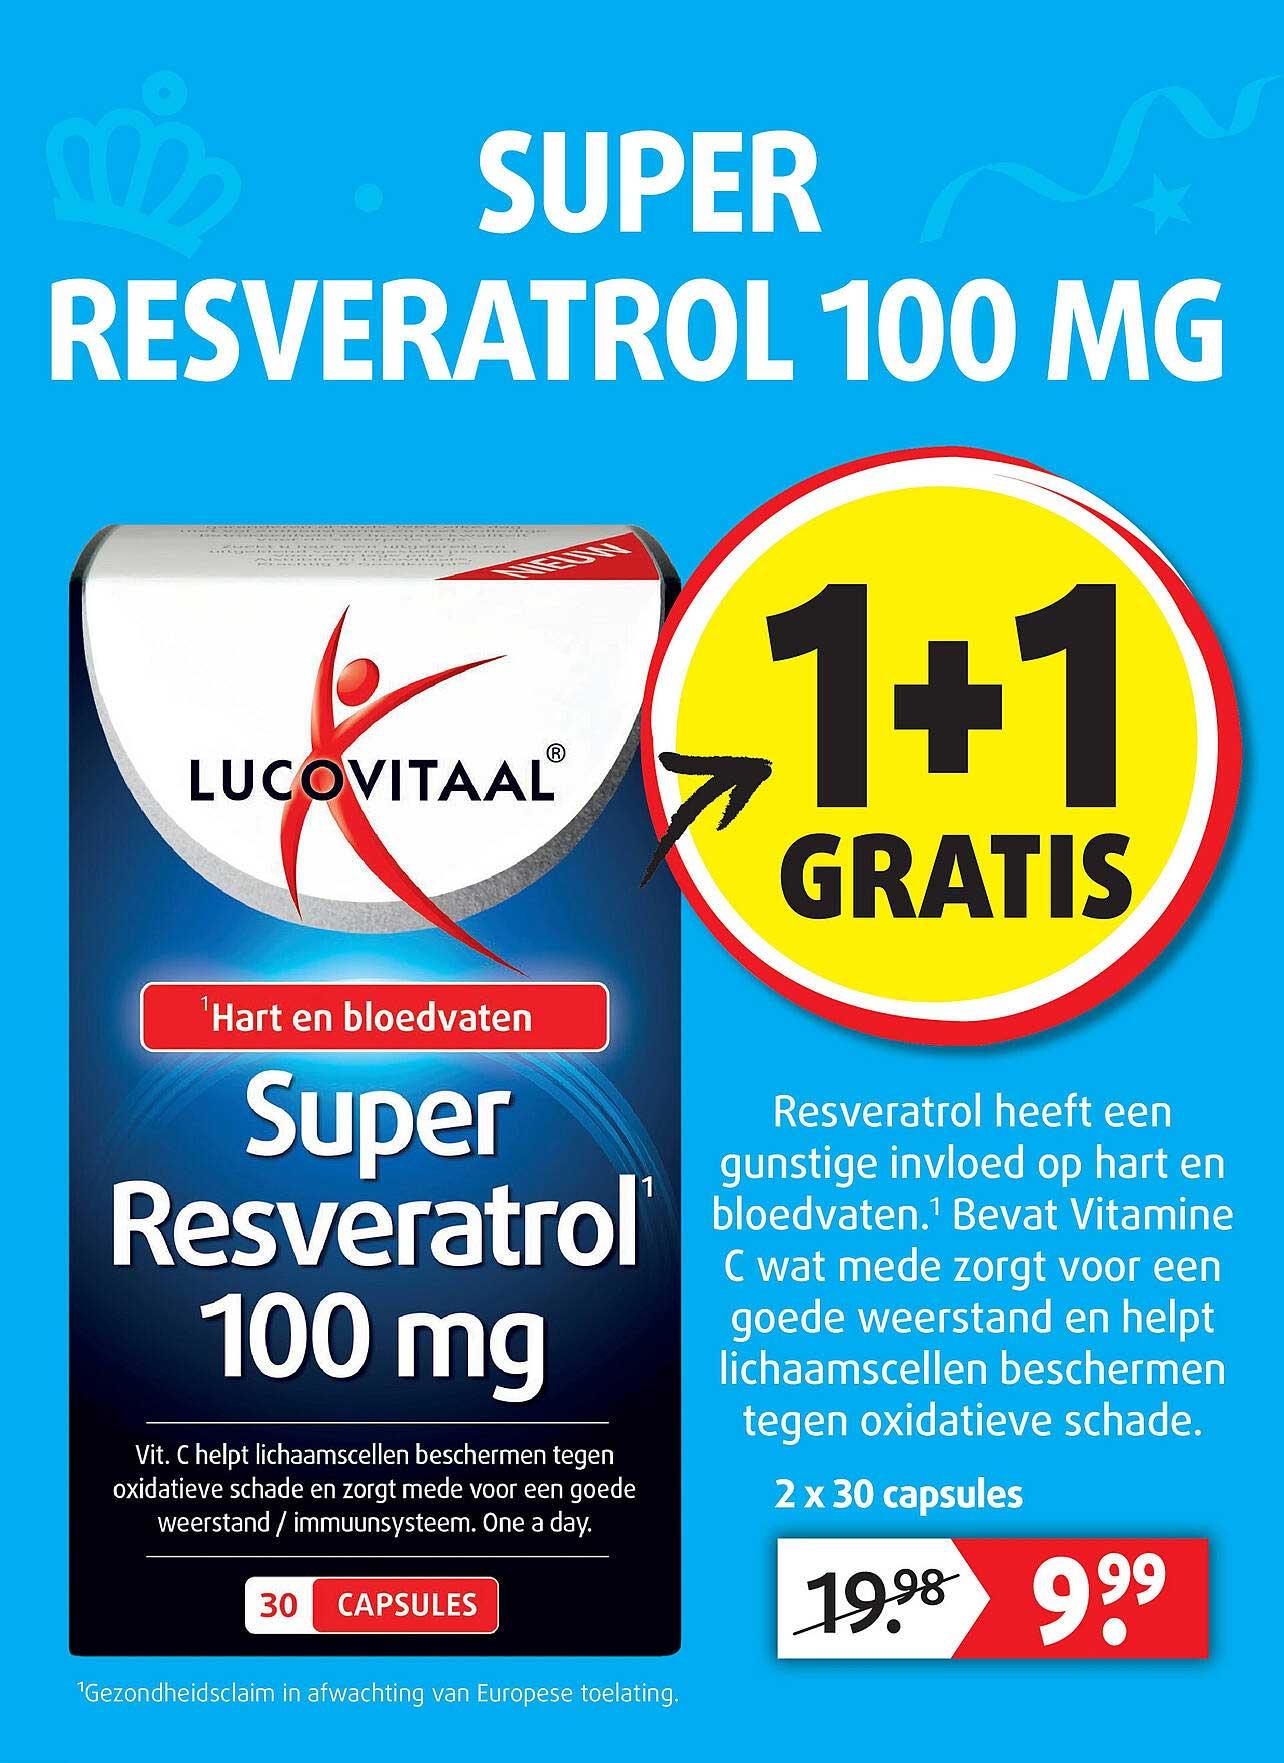 Lucovitaal Lucovitaal Super Resveratrol 100 Mg 1+1 Gratis